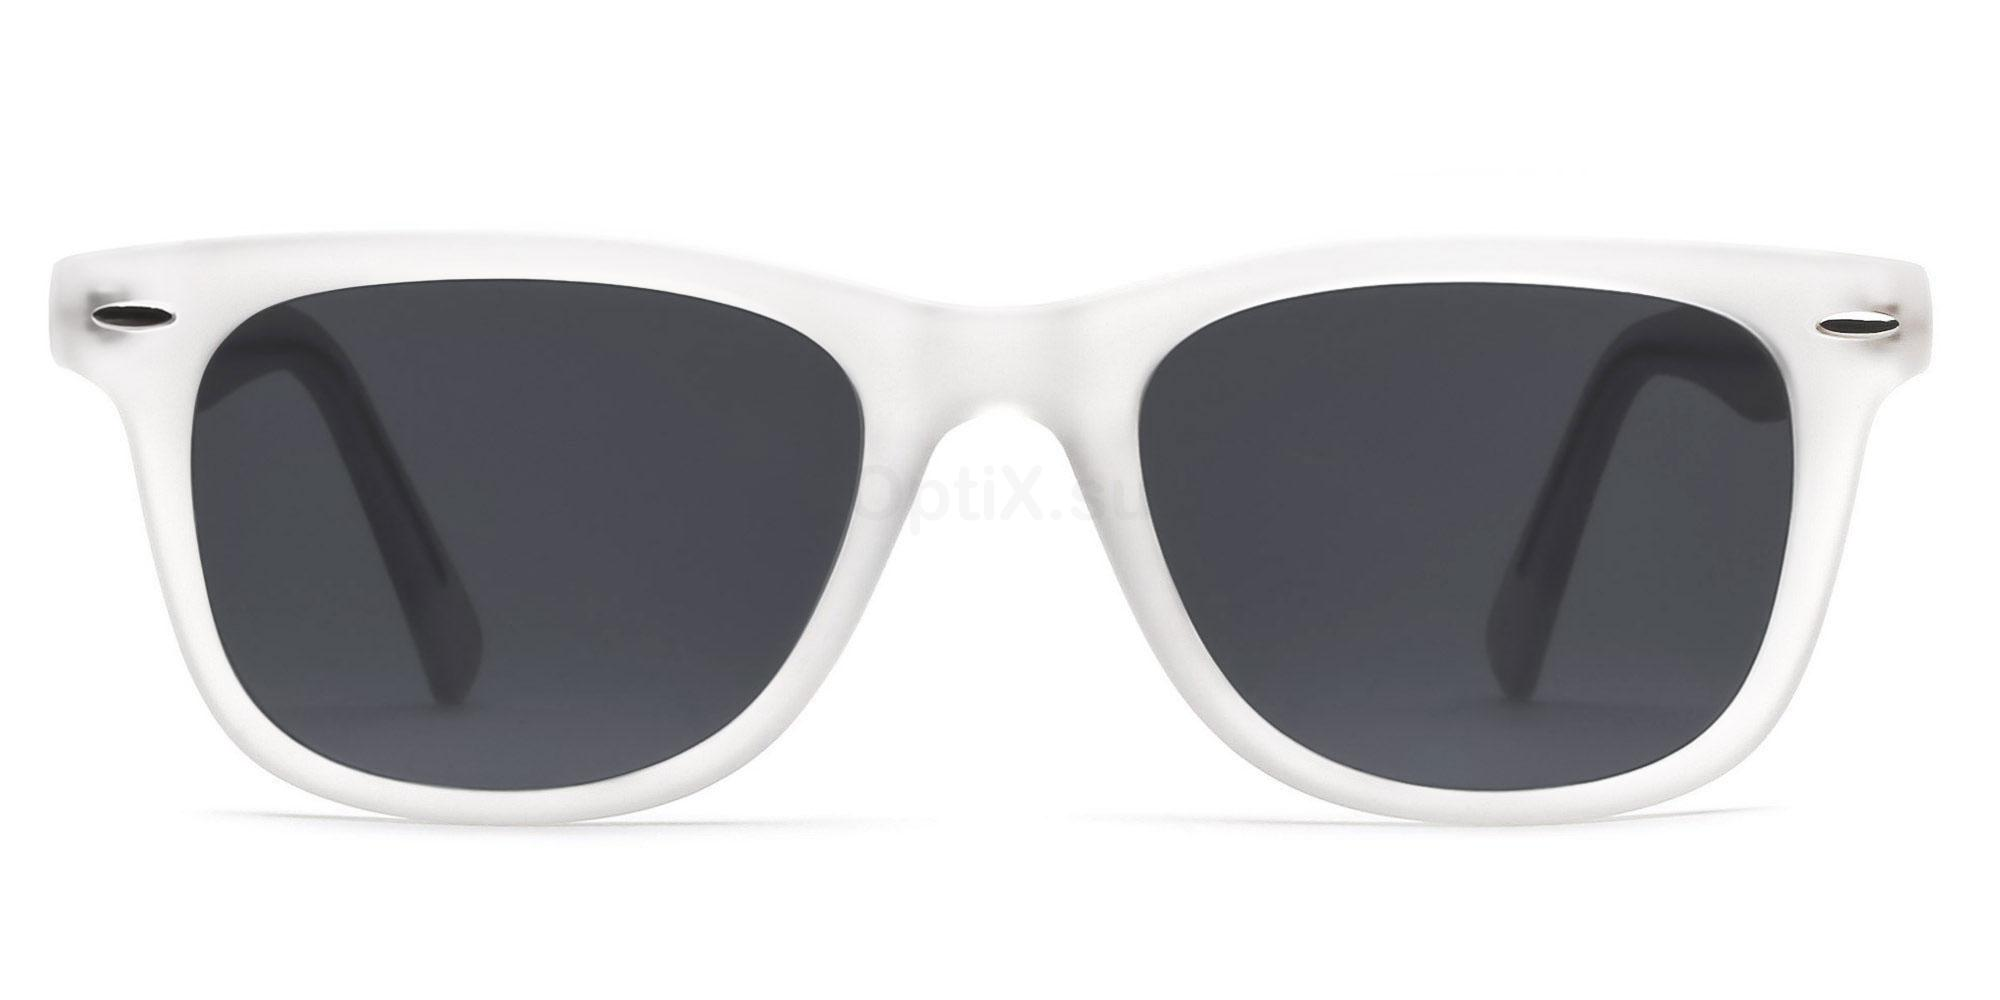 C10 8121 - Clear (Sunglasses) , Savannah